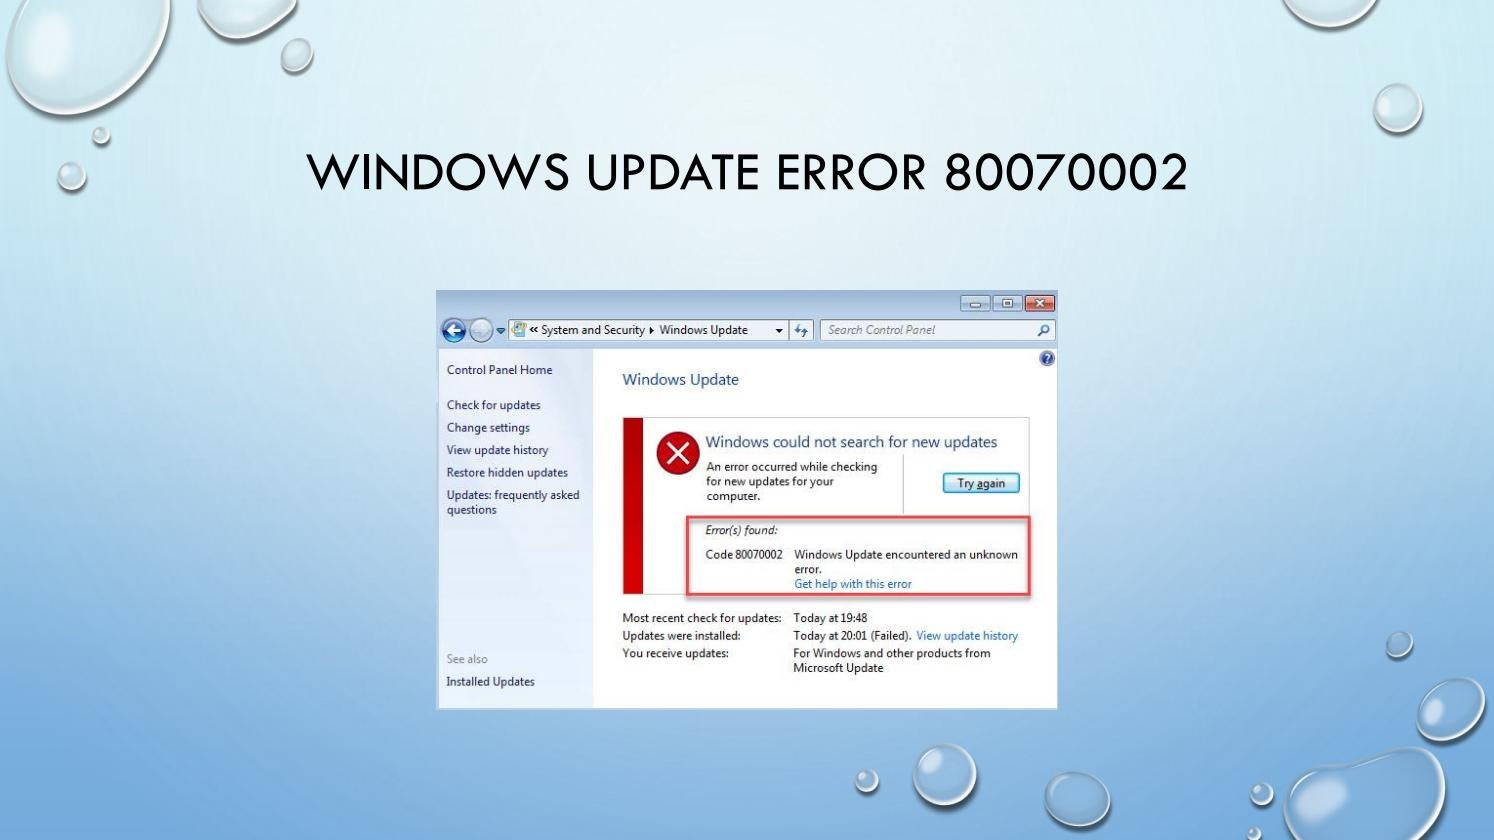 How to Fix Windows Update Error 80070002 in Windows 10 by